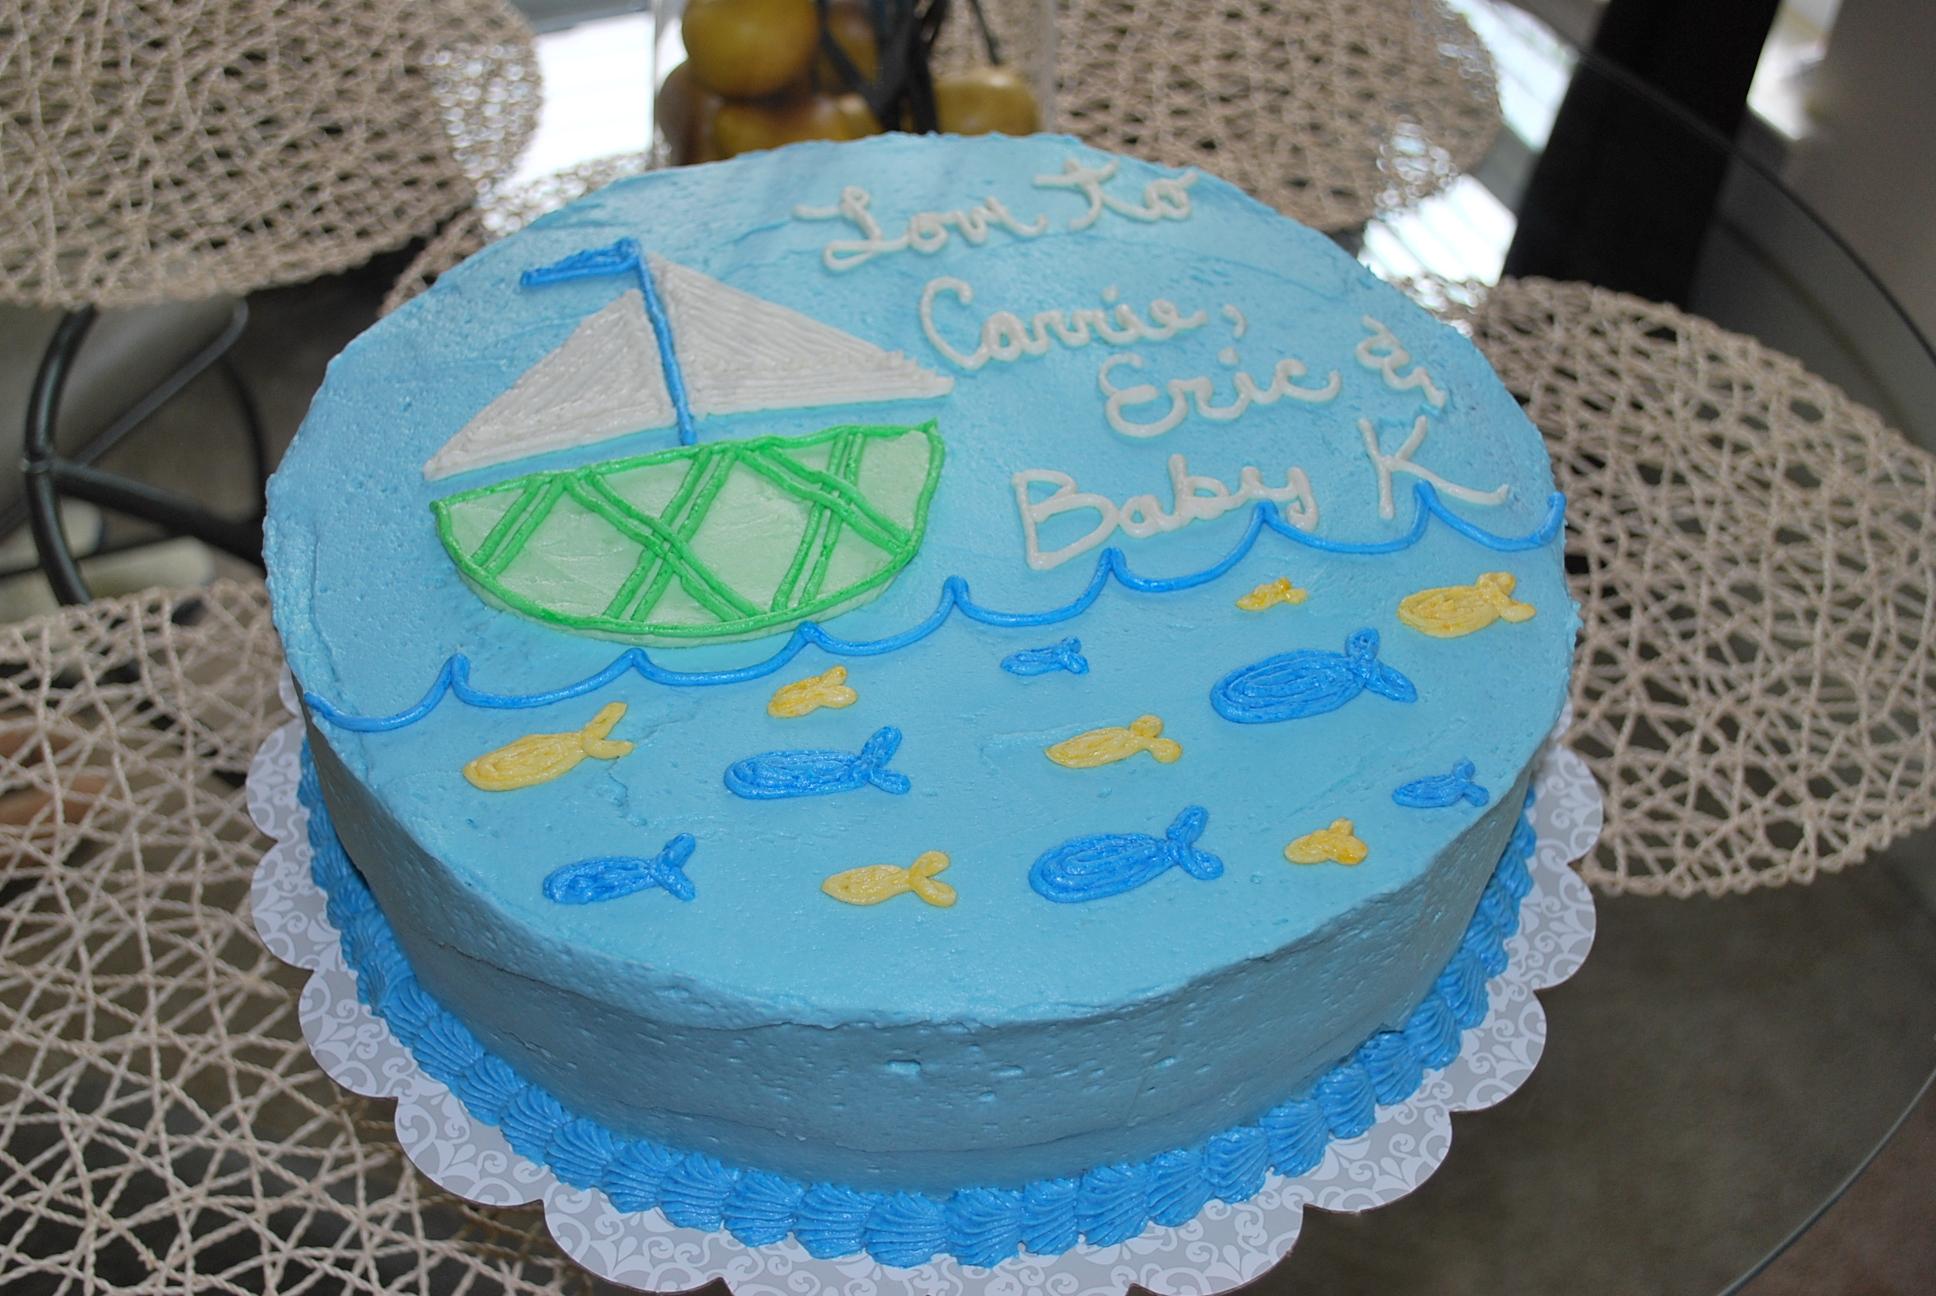 Karas Cakery Blog › sailboat baby shower cake